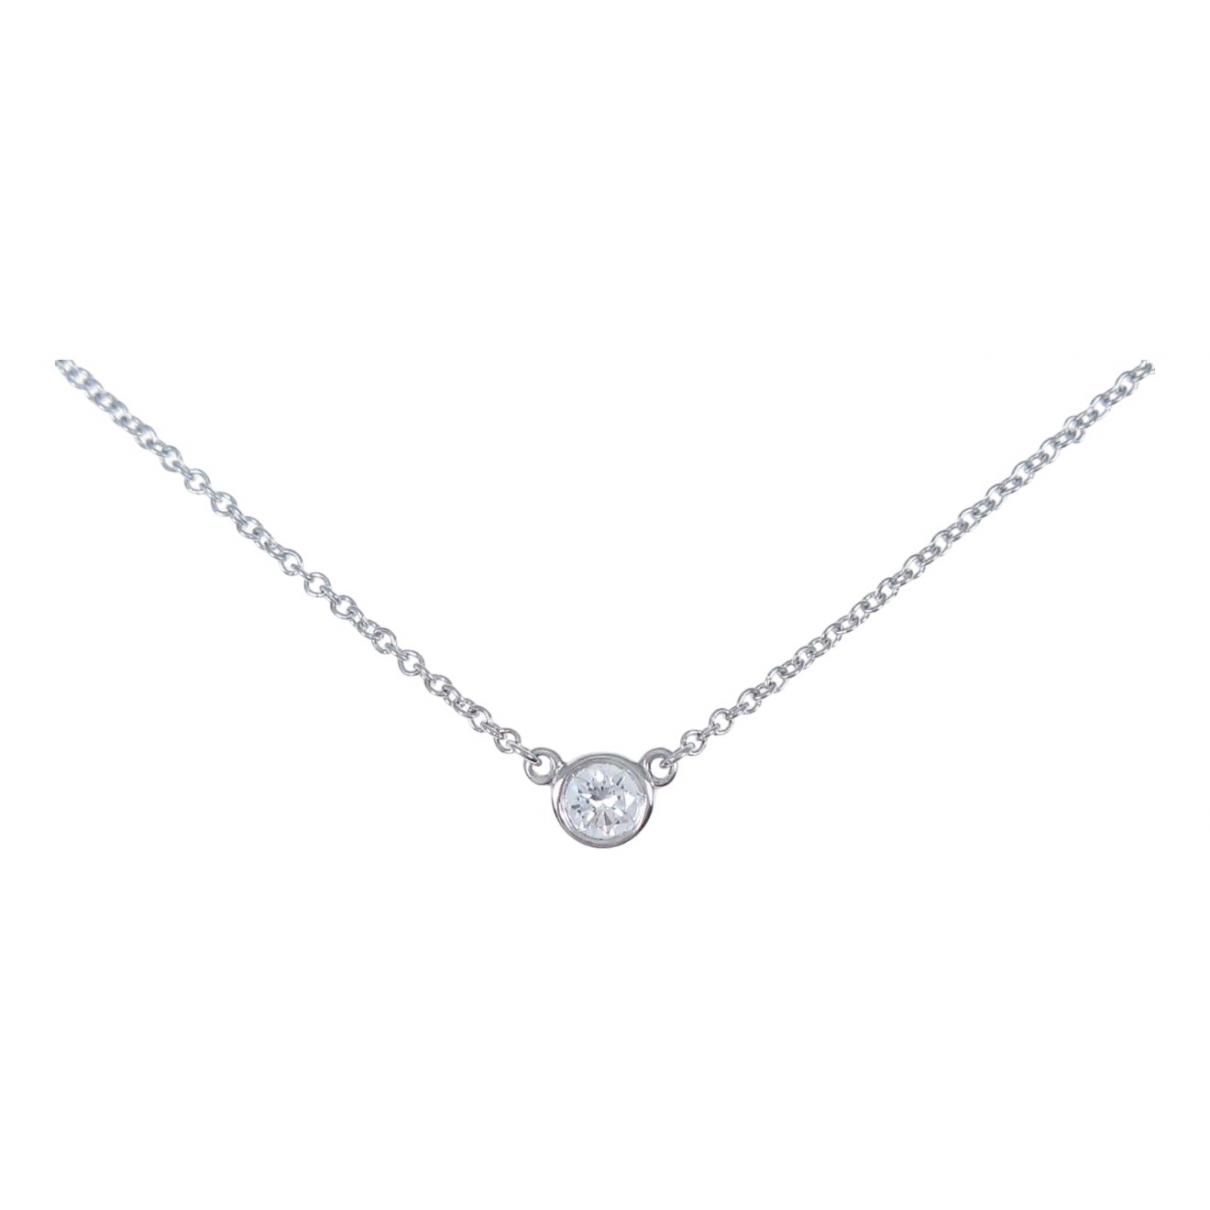 Tiffany & Co Elsa Peretti  Kette in  Silber Platin